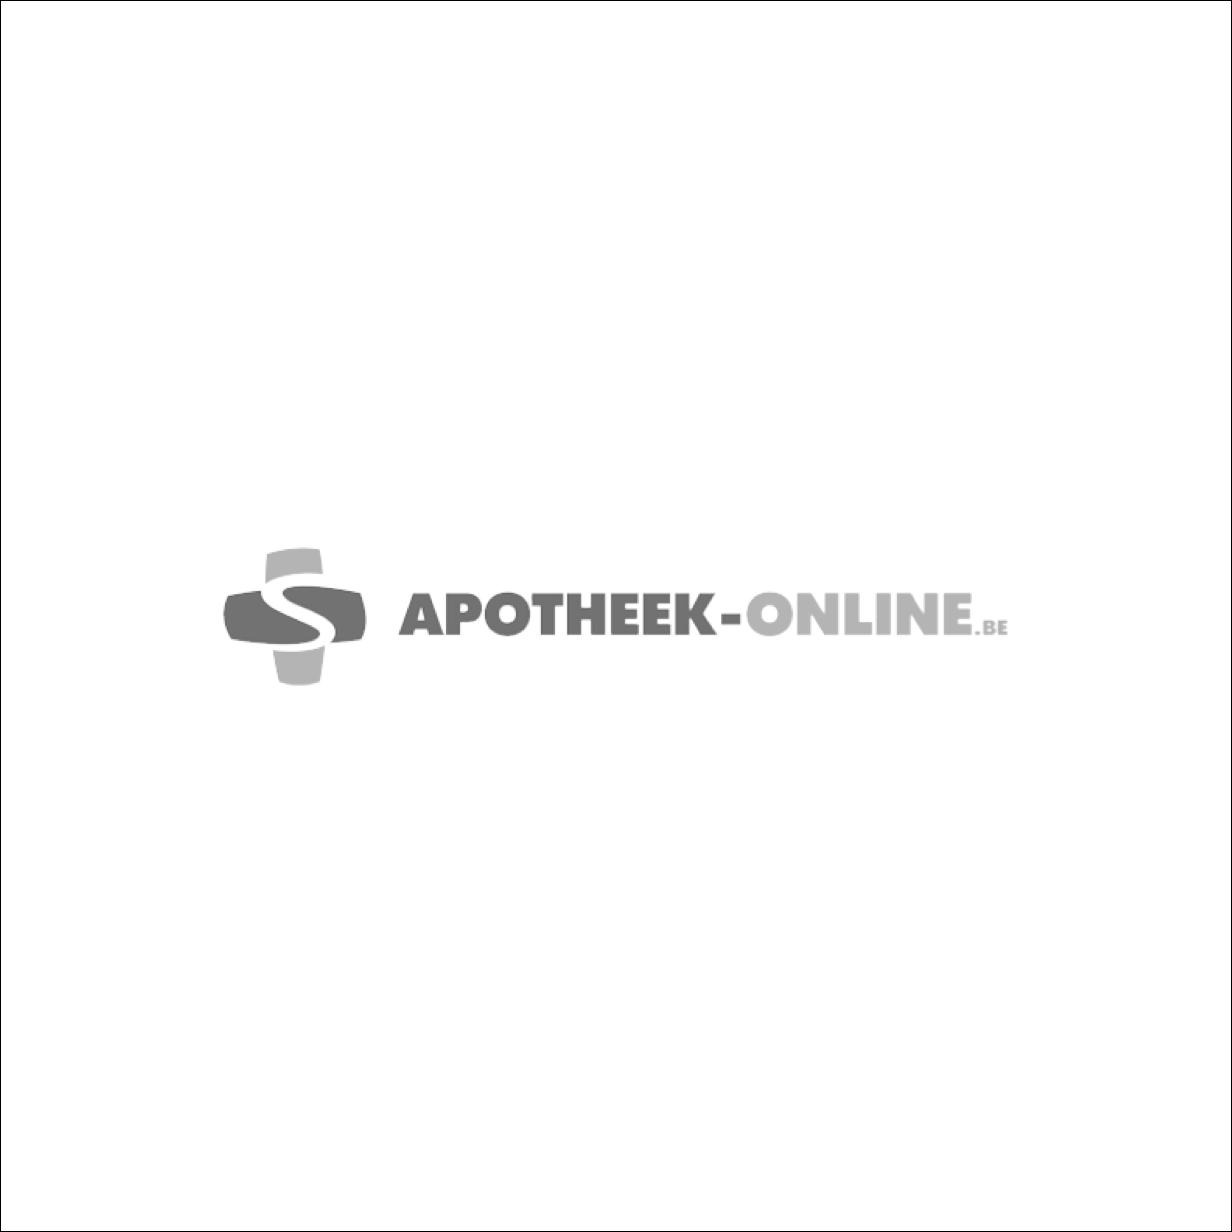 Dermaplast Hosp Sensitive 6cmx5m 1 5353611